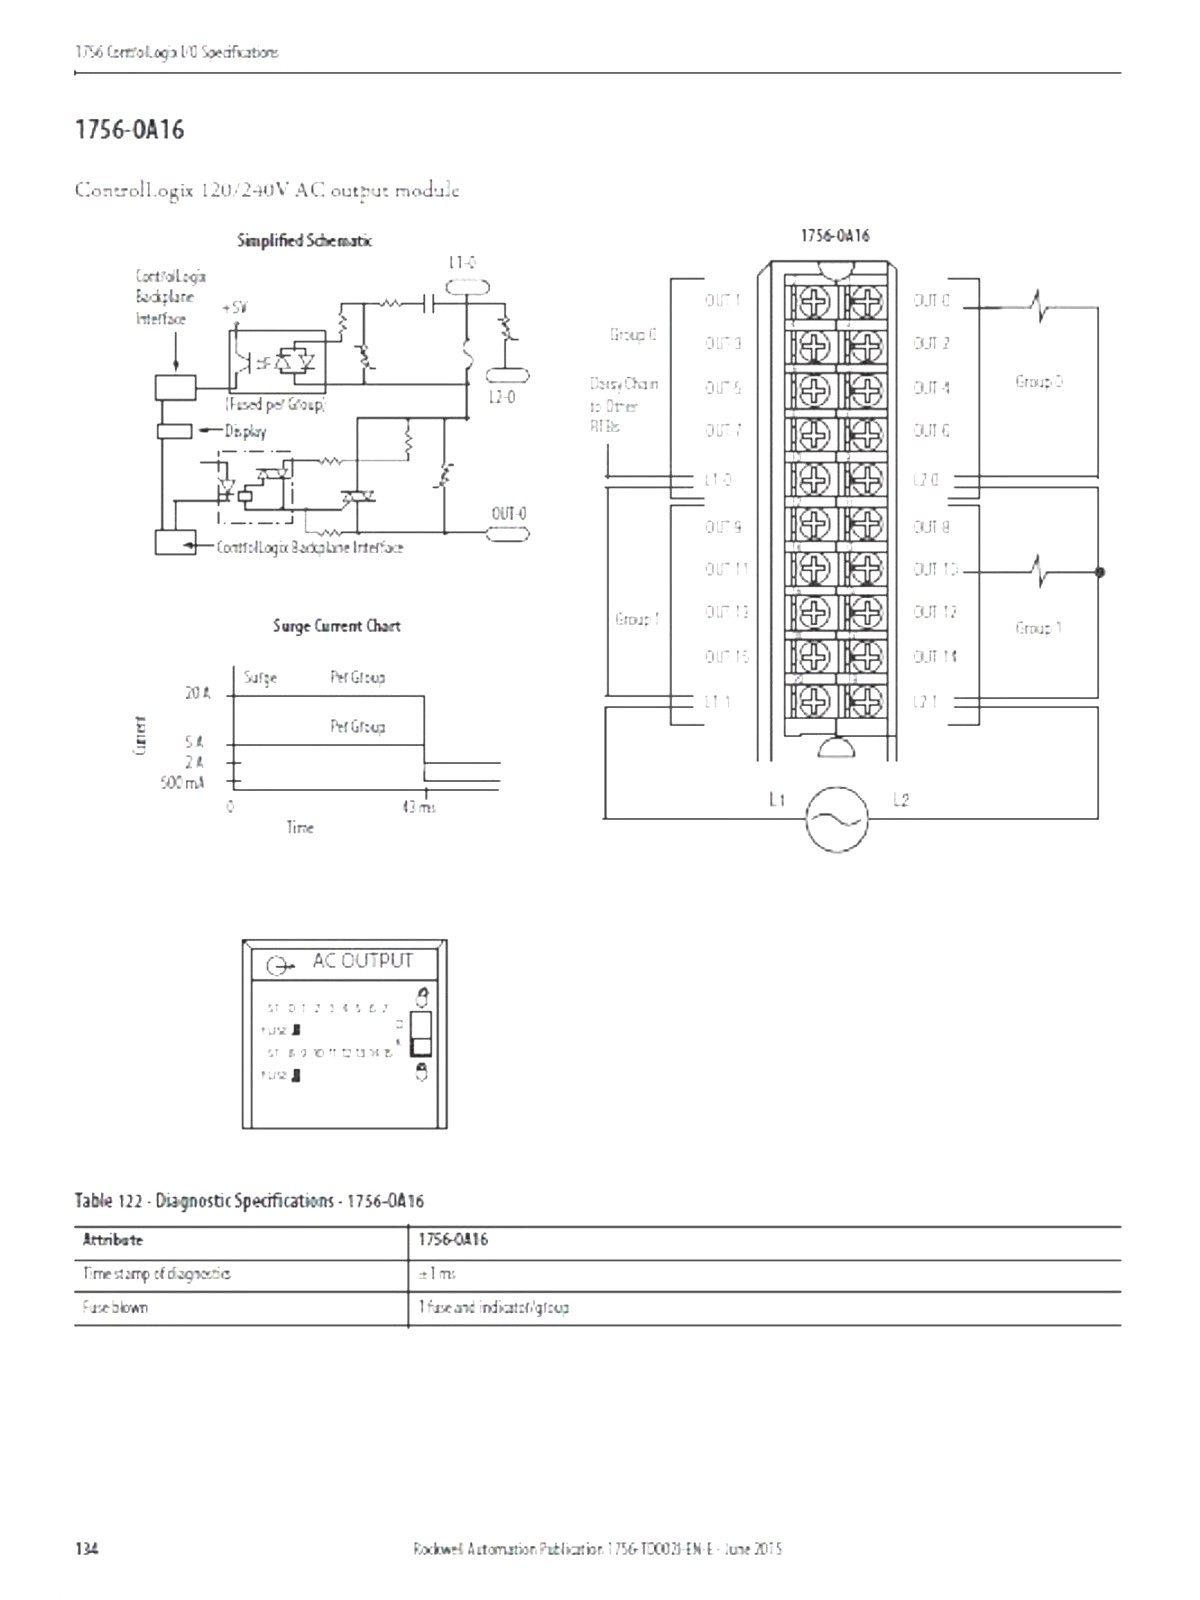 DIAGRAM] Ferrari 512 Tr For Wiring Diagram FULL Version HD ... on kenwood model kdc wiring-diagram, kenwood kvt-516 wiring-diagram, kenwood kdc 138 pinout, kenwood usb cable diagram, kenwood kdc 148 pin out, kenwood ddx6019 wiring-diagram, kenwood kdc mp232 wiring-diagram, kenwood ddx418 wiring harness diagram, kenwood stereo wiring diagram, kenwood mike wiring-diagram, kenwood excelon ddx7015 wiring-diagram,